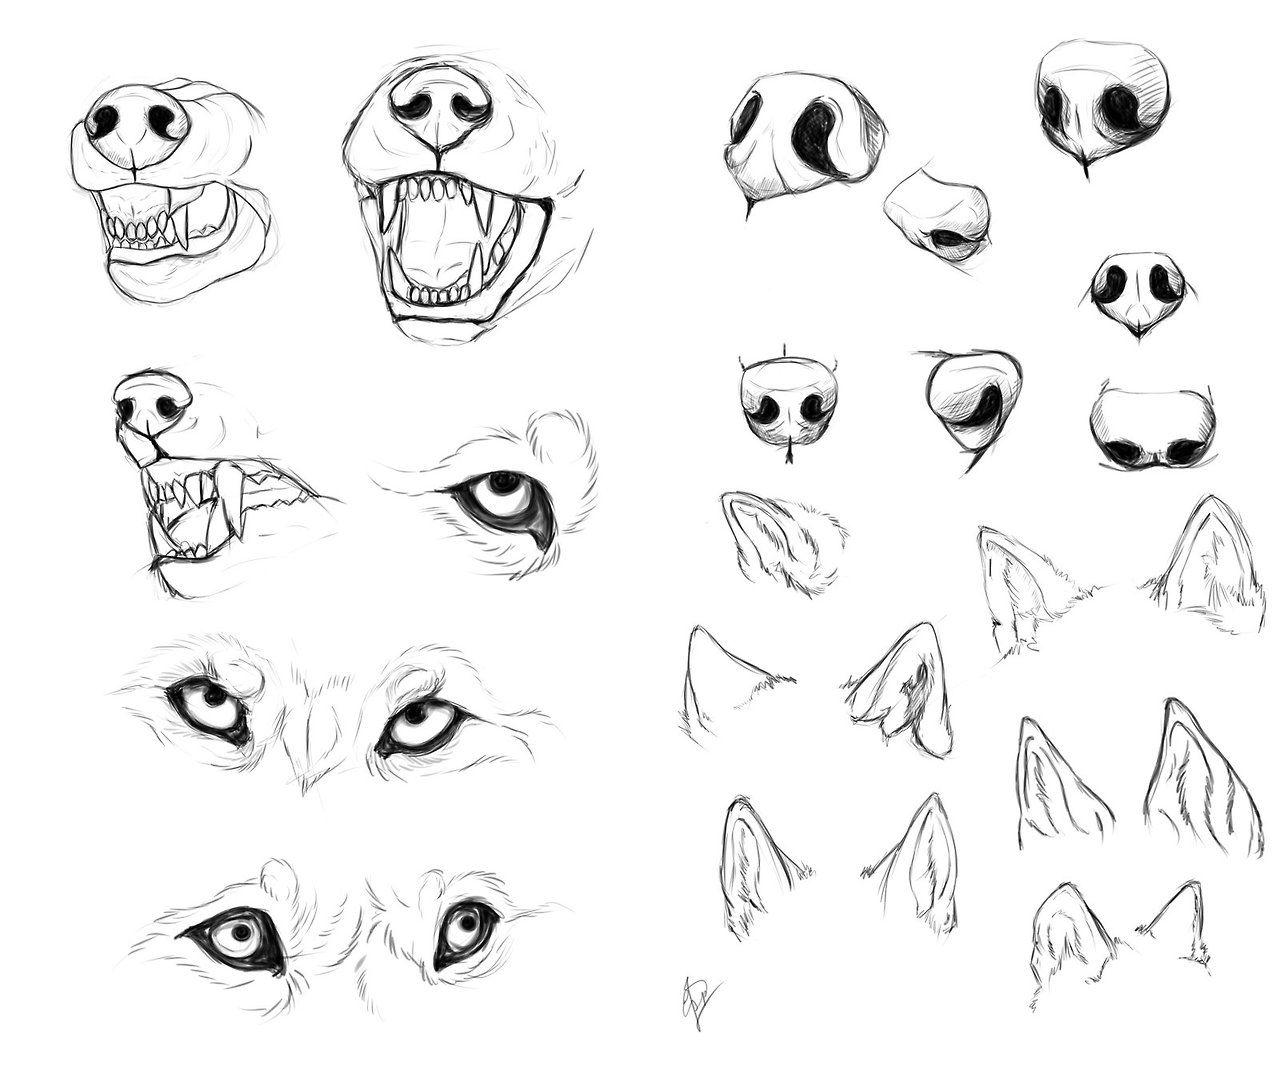 Hocicos Lobos En 2019 Pinterest Anatomia Dibujo Lobo Dibujo Y